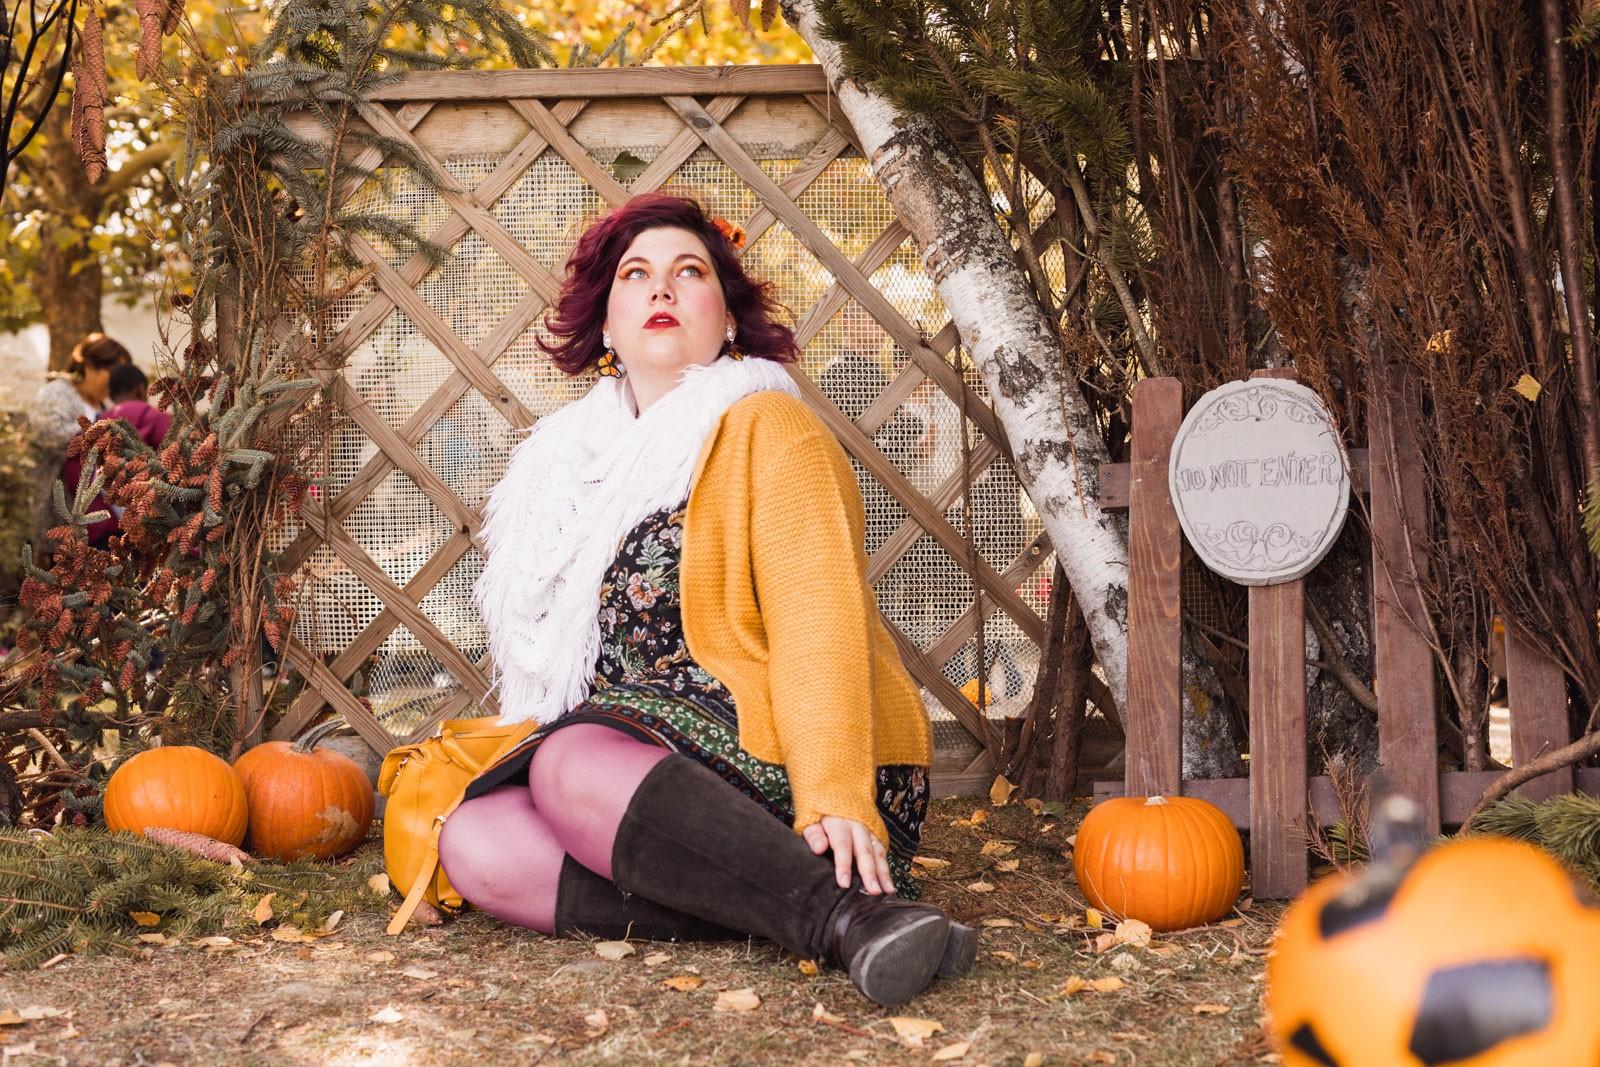 ninaah bulles, isabella, blancheporte, grande taille, plussize, automne, halloween, moutarde, blog mode